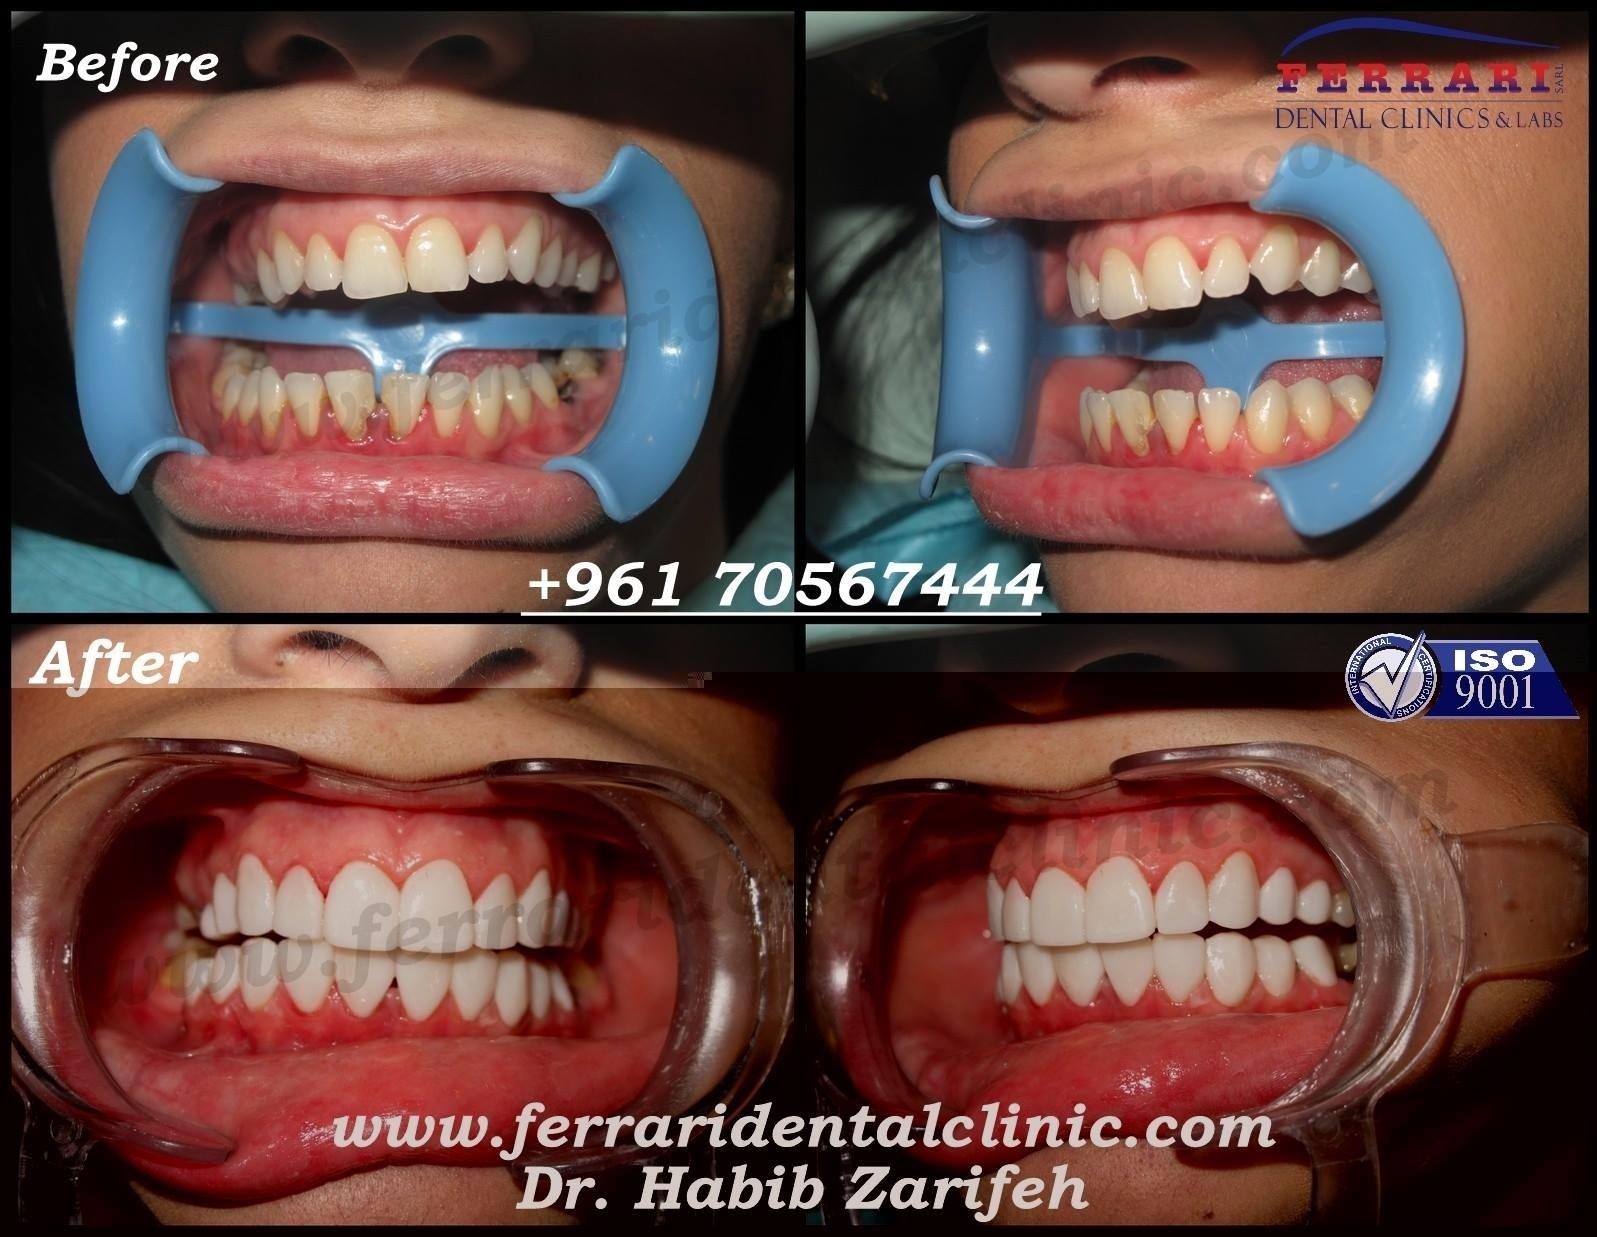 Visit Dental Clinic For Teeth Whitening Or Dental Implants Veneers Hollywood Smile Lebanon Dentist Dr Zarifeh The